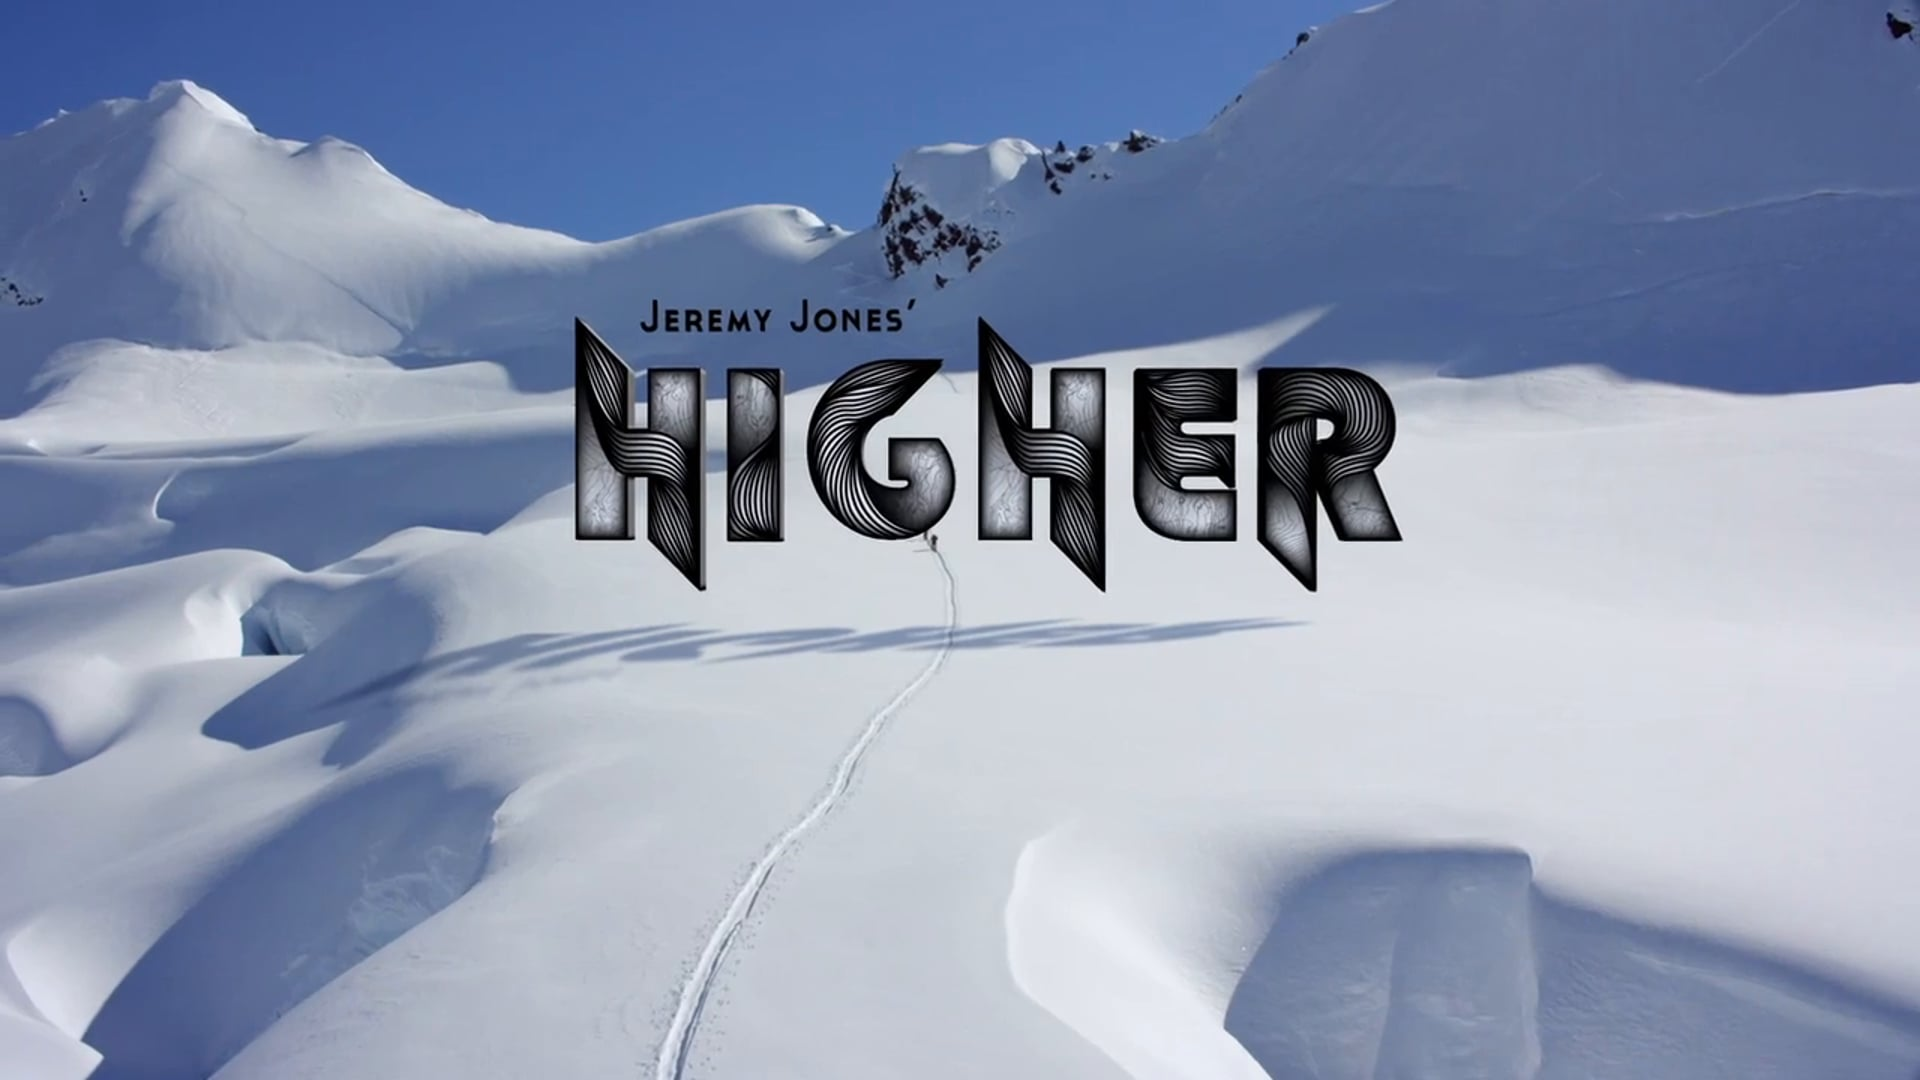 Jeremy Jones' Higher EP7 Nepal